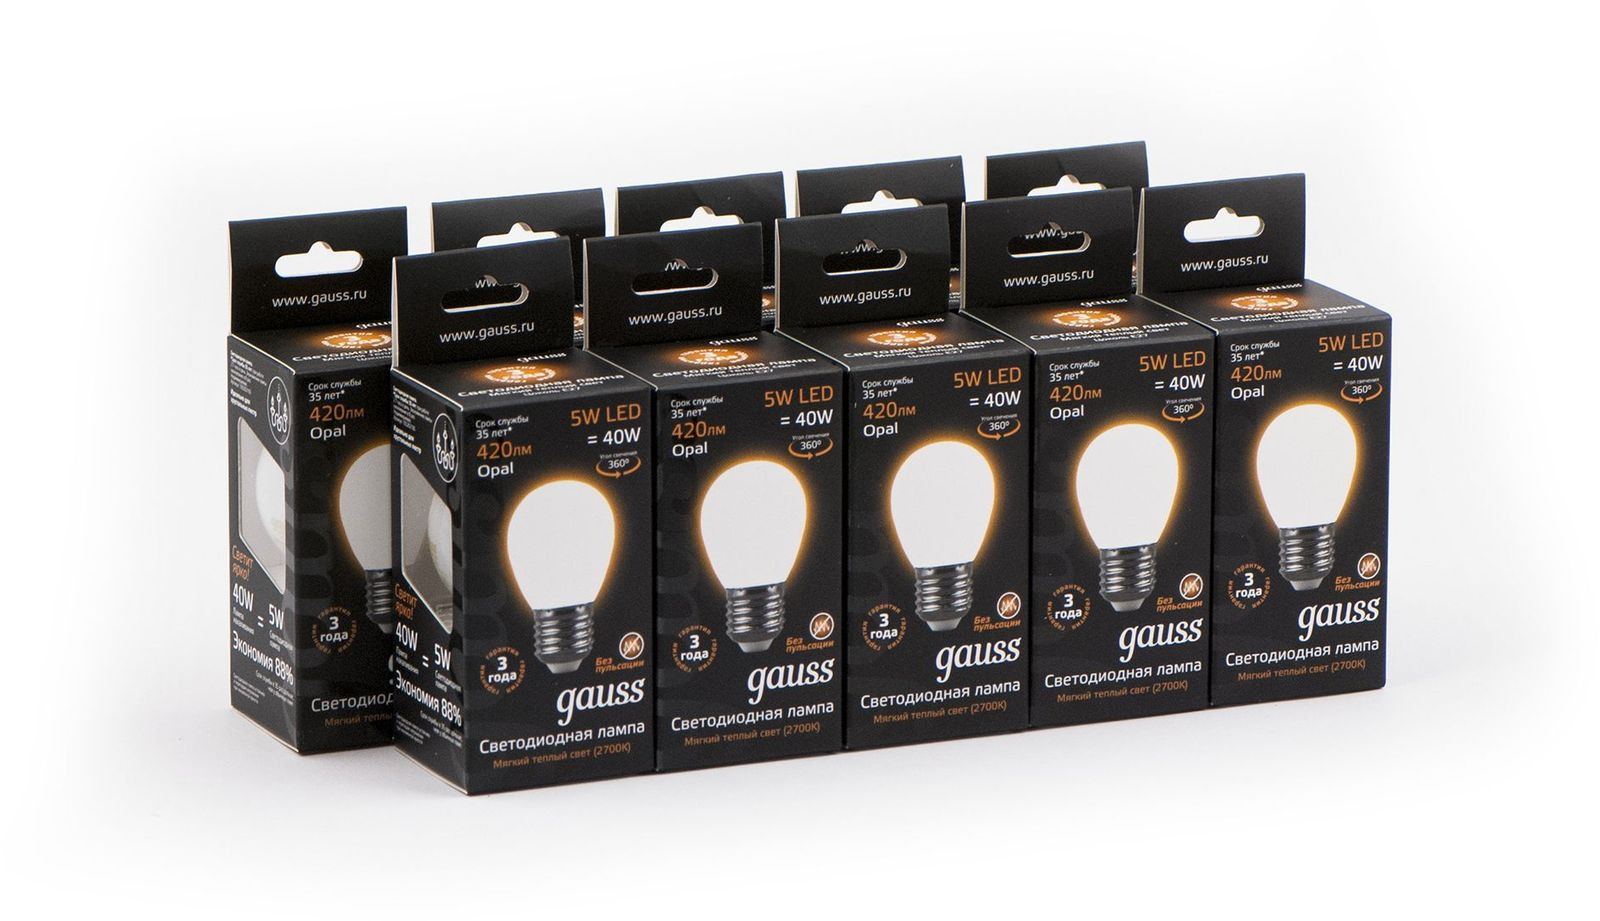 Лампочка Gauss Светодиодная Black Filament Шар Opal 10 шт, Теплый свет 5 Вт, Светодиодная лампочка gauss black filament opal led свеча e14 5w 103201105